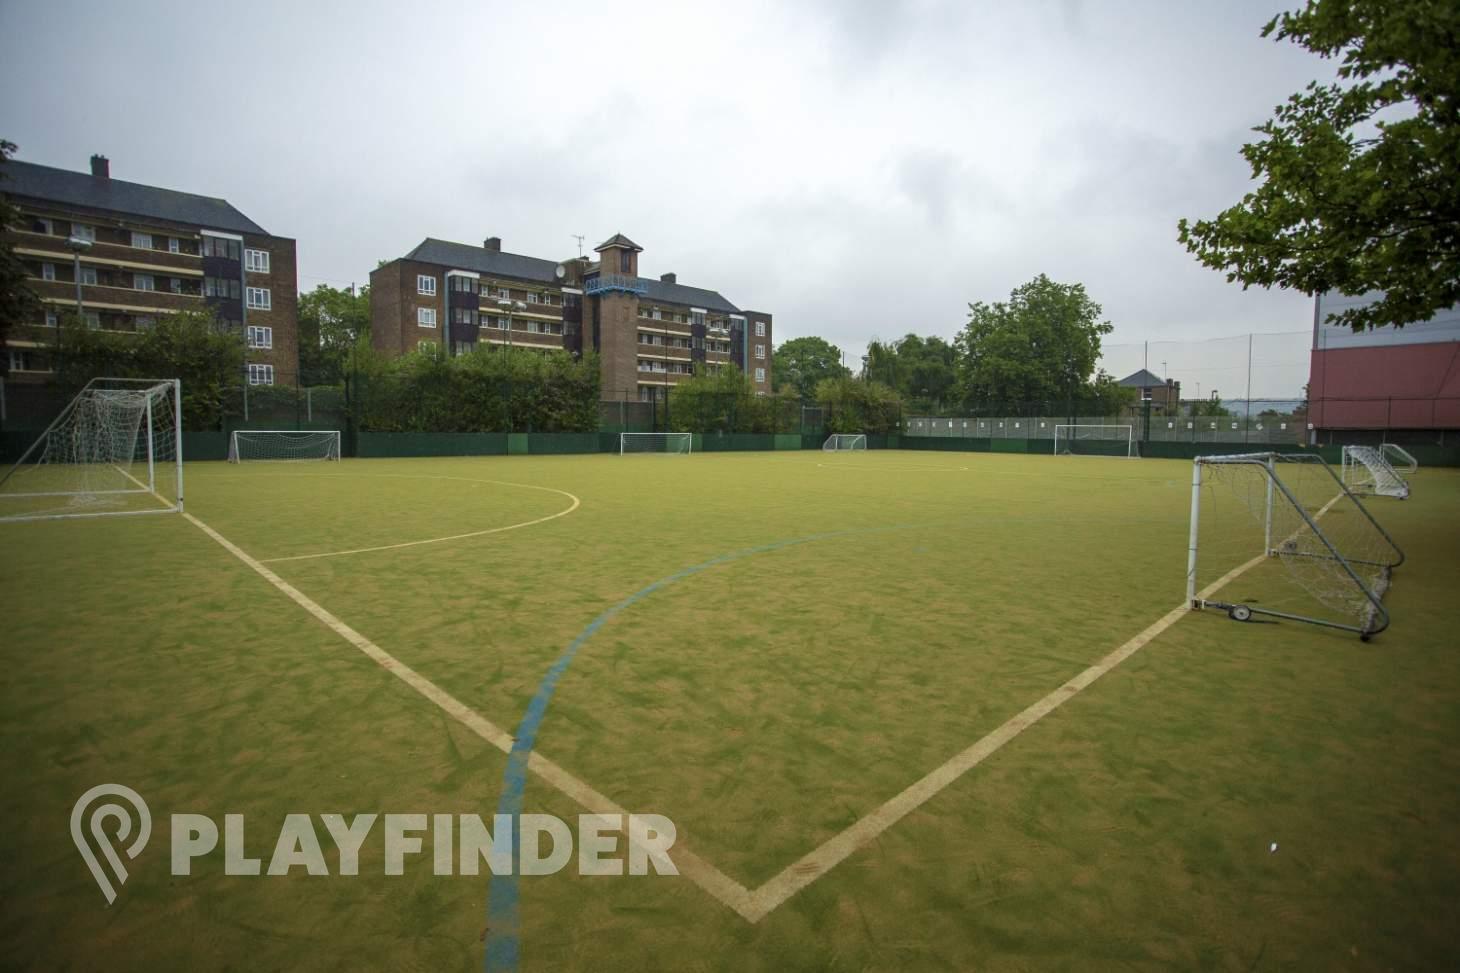 PlayFootball Holloway 7 a side | Astroturf football pitch